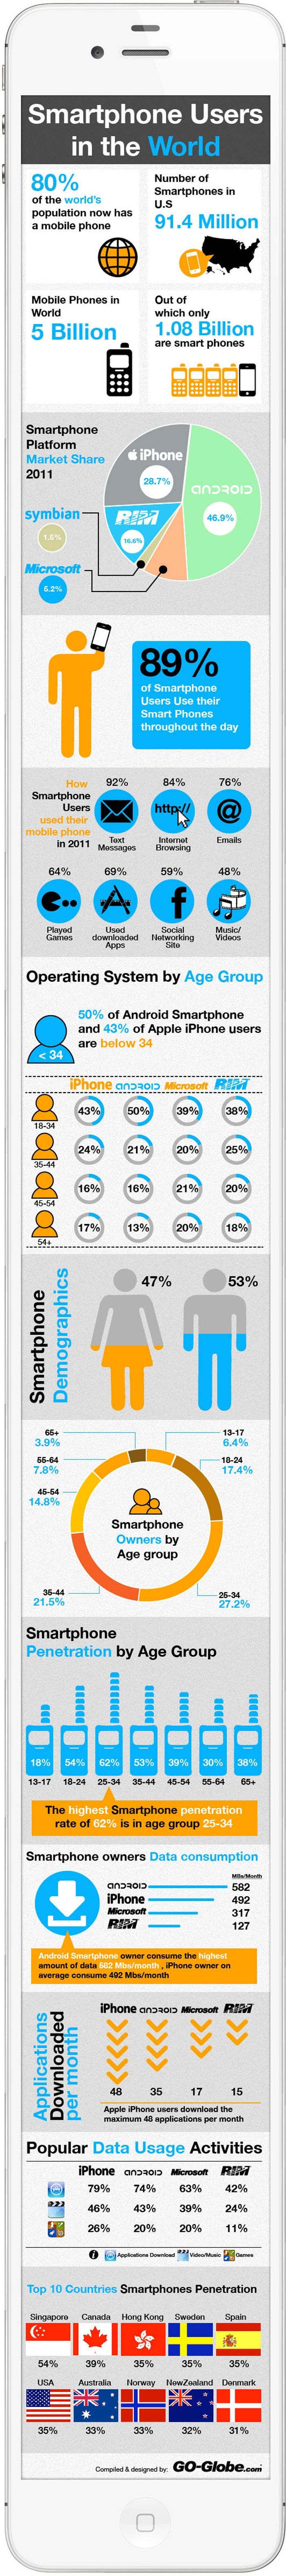 Smartphone Usage Statistics 2012 Infographic